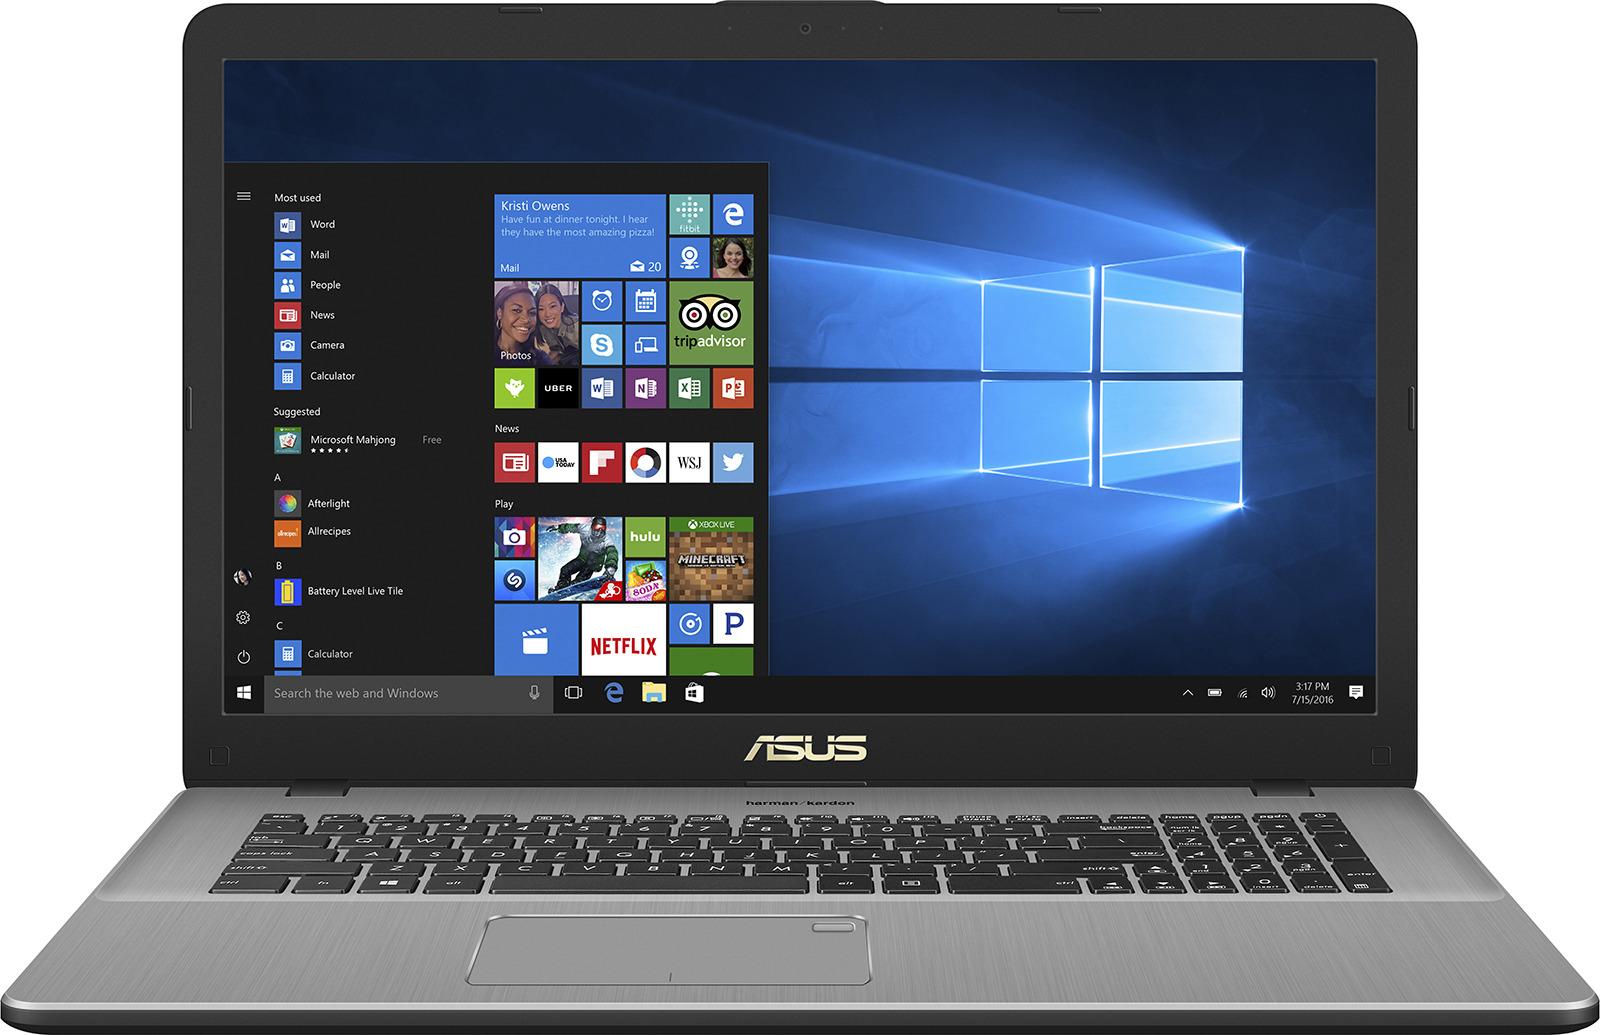 17.3 Ноутбук ASUS VivoBook Pro 17 N705UN 90NB0GV1-M02240, серый ноутбук asus vivobook pro 15 n580gd e4128t 90nb0hx4 m02950